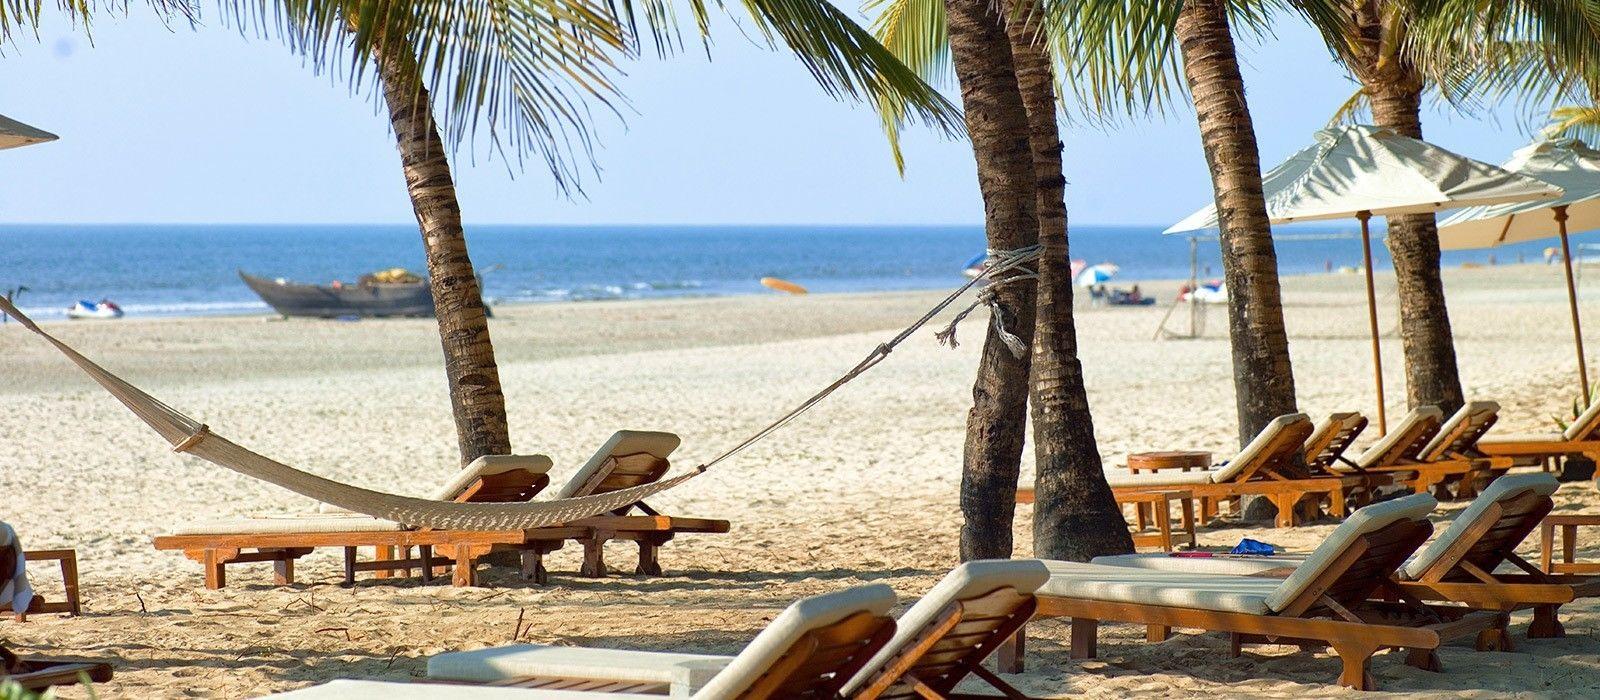 Reiseziel Goa Zentral- & Westindien